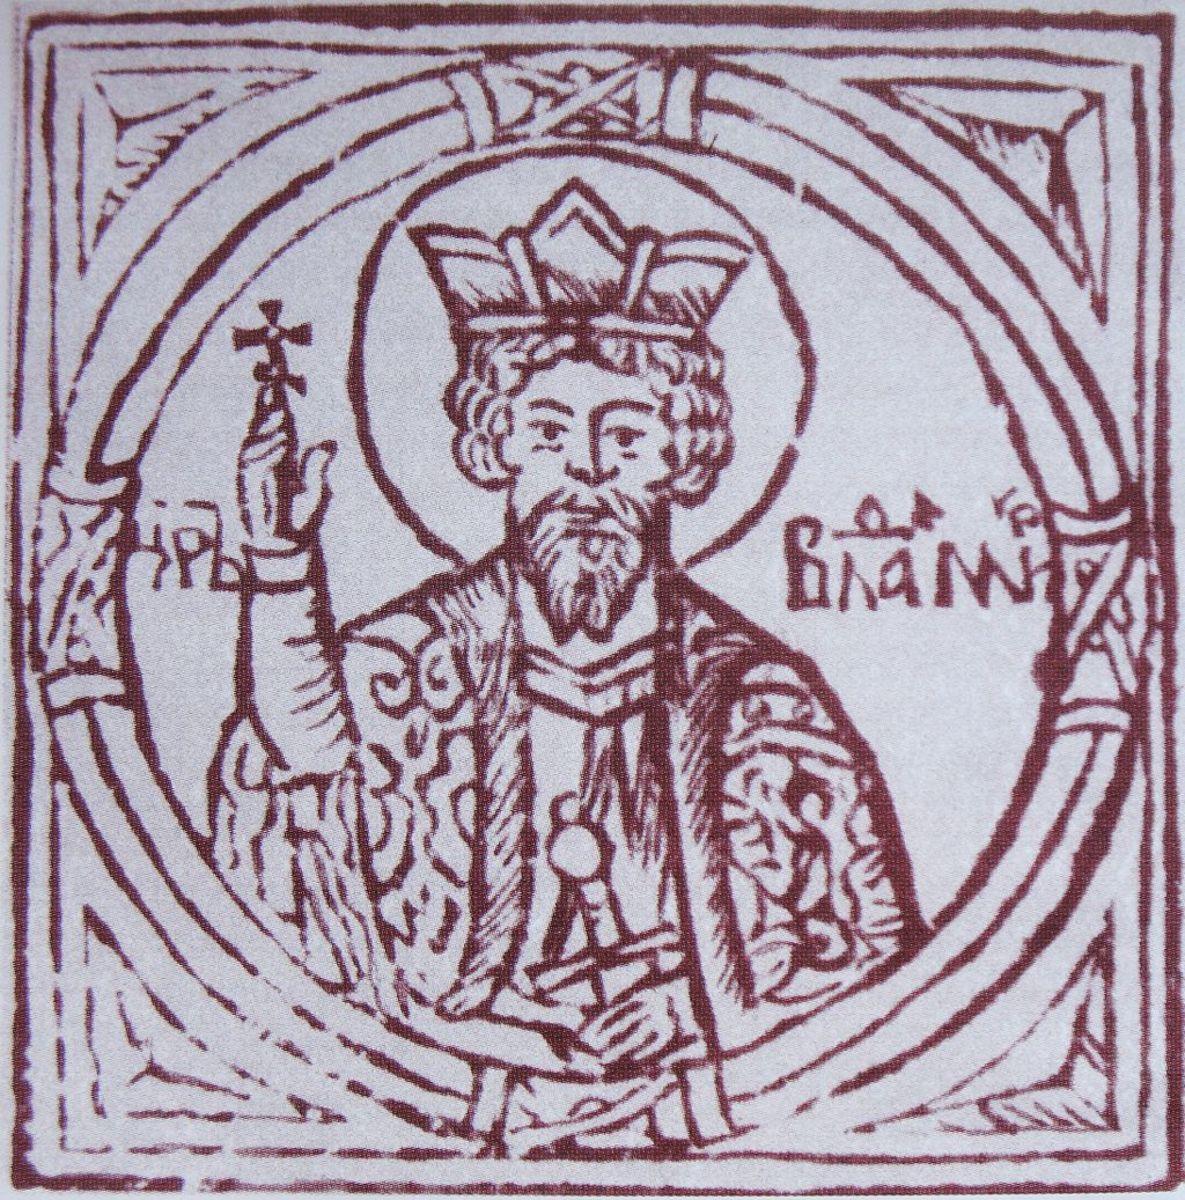 Prince Vladimir I